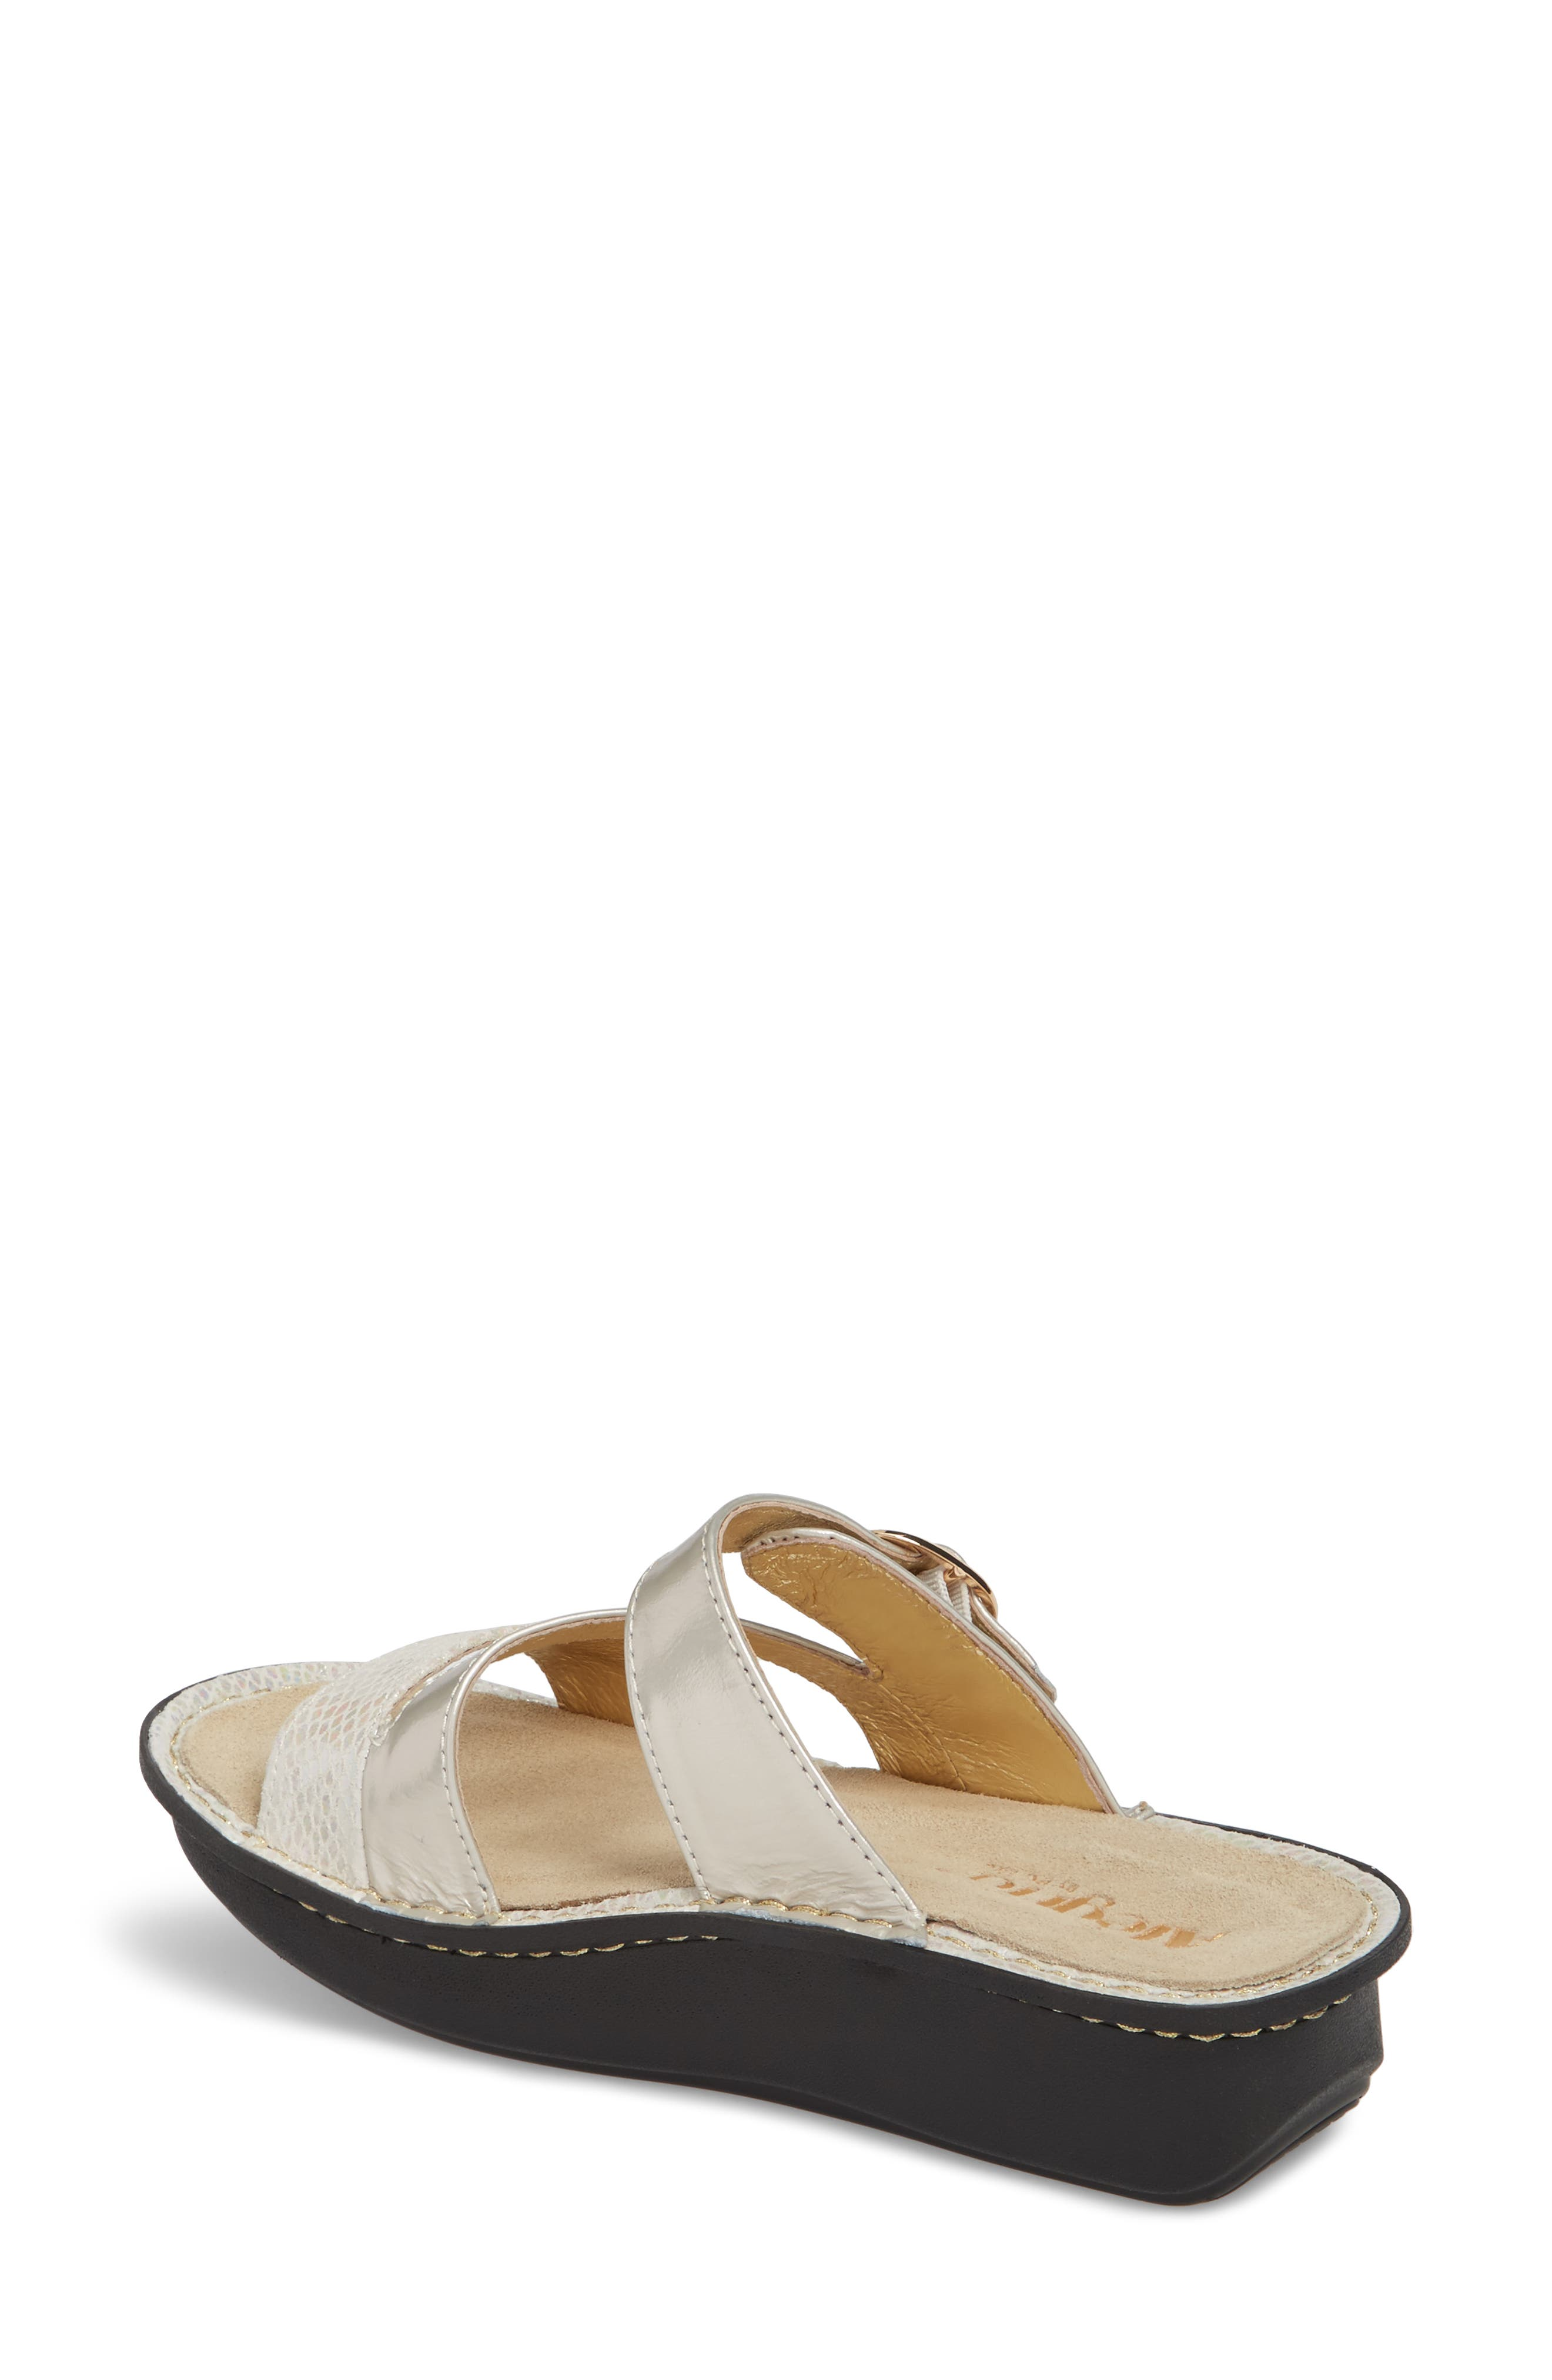 ALEGRIA, 'Colette' Platform Sandal, Alternate thumbnail 2, color, OPFULLY LEATHER